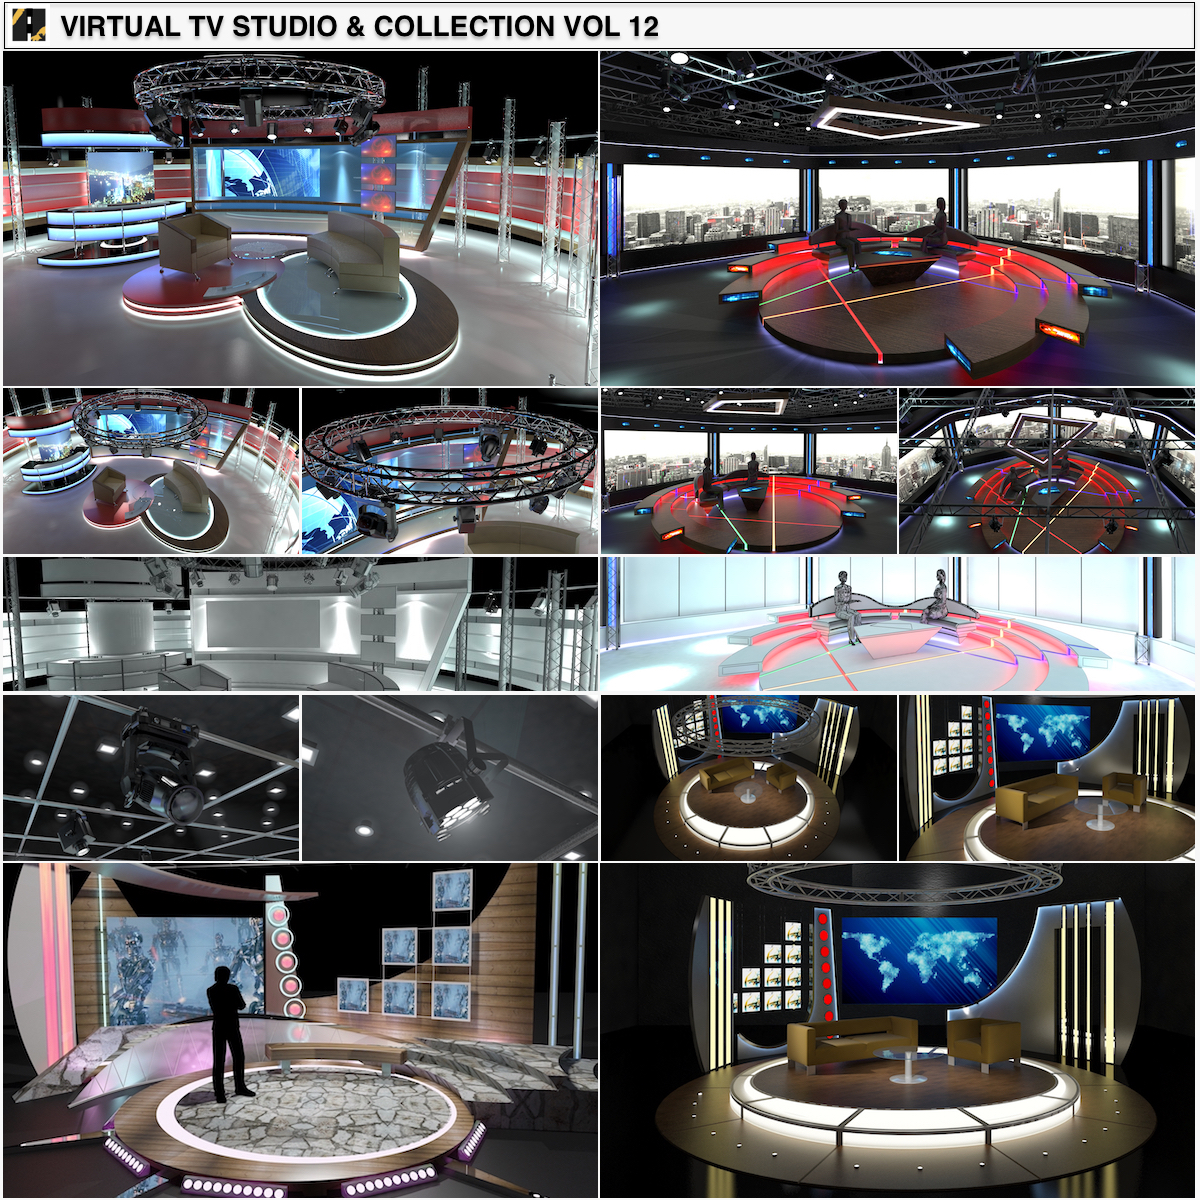 0_04_TV Studio Chat Sets-Collection Vol